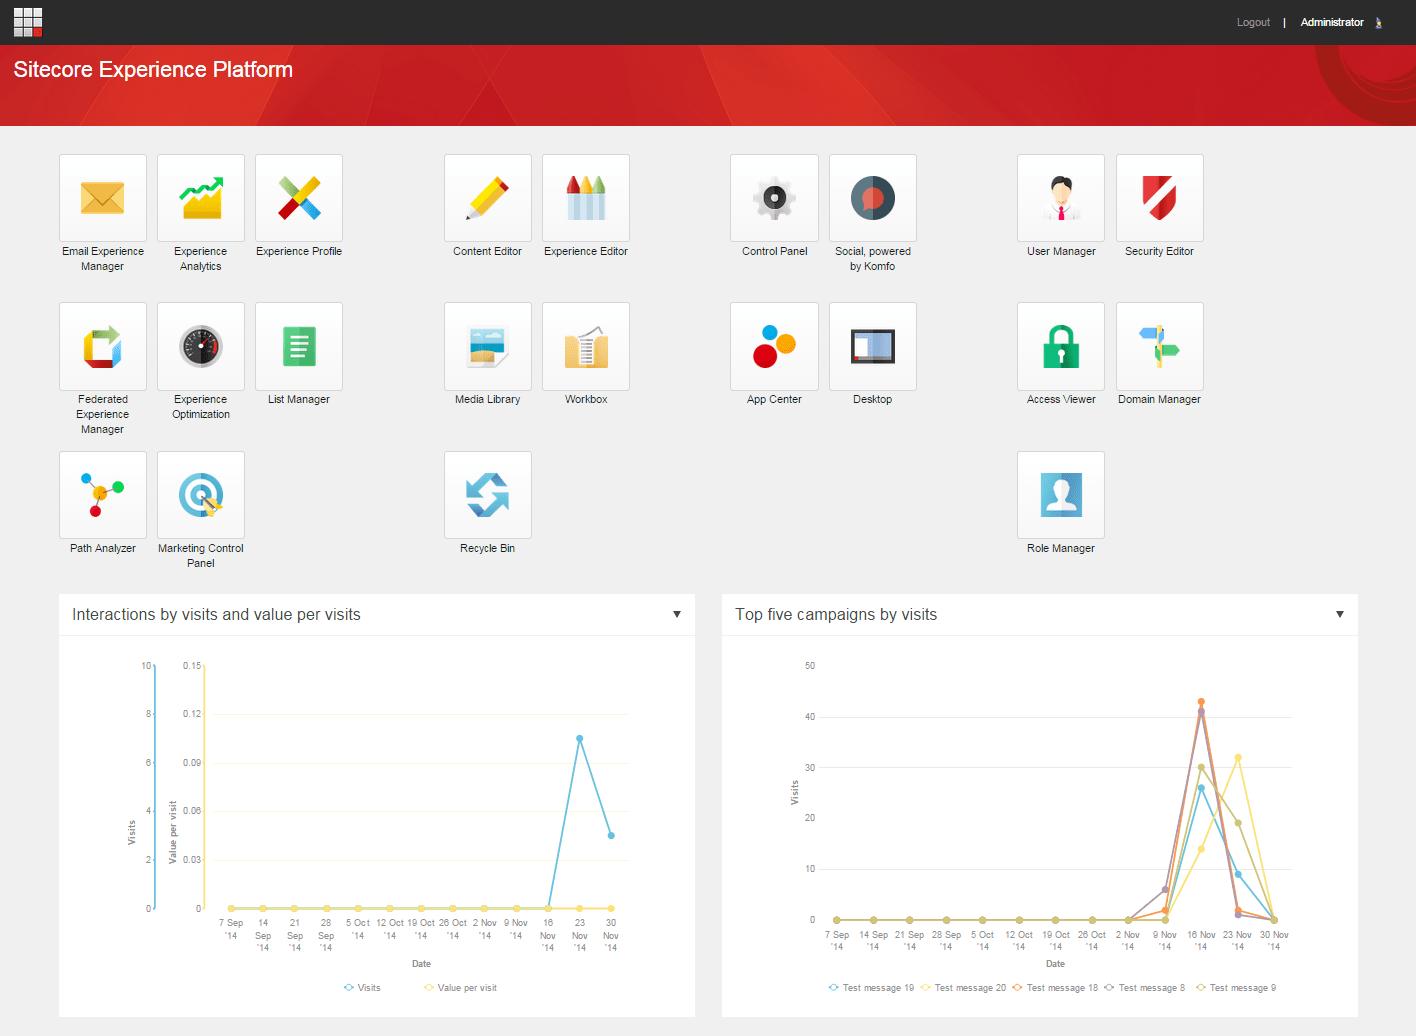 Sitecore-XP-admin-panel-image